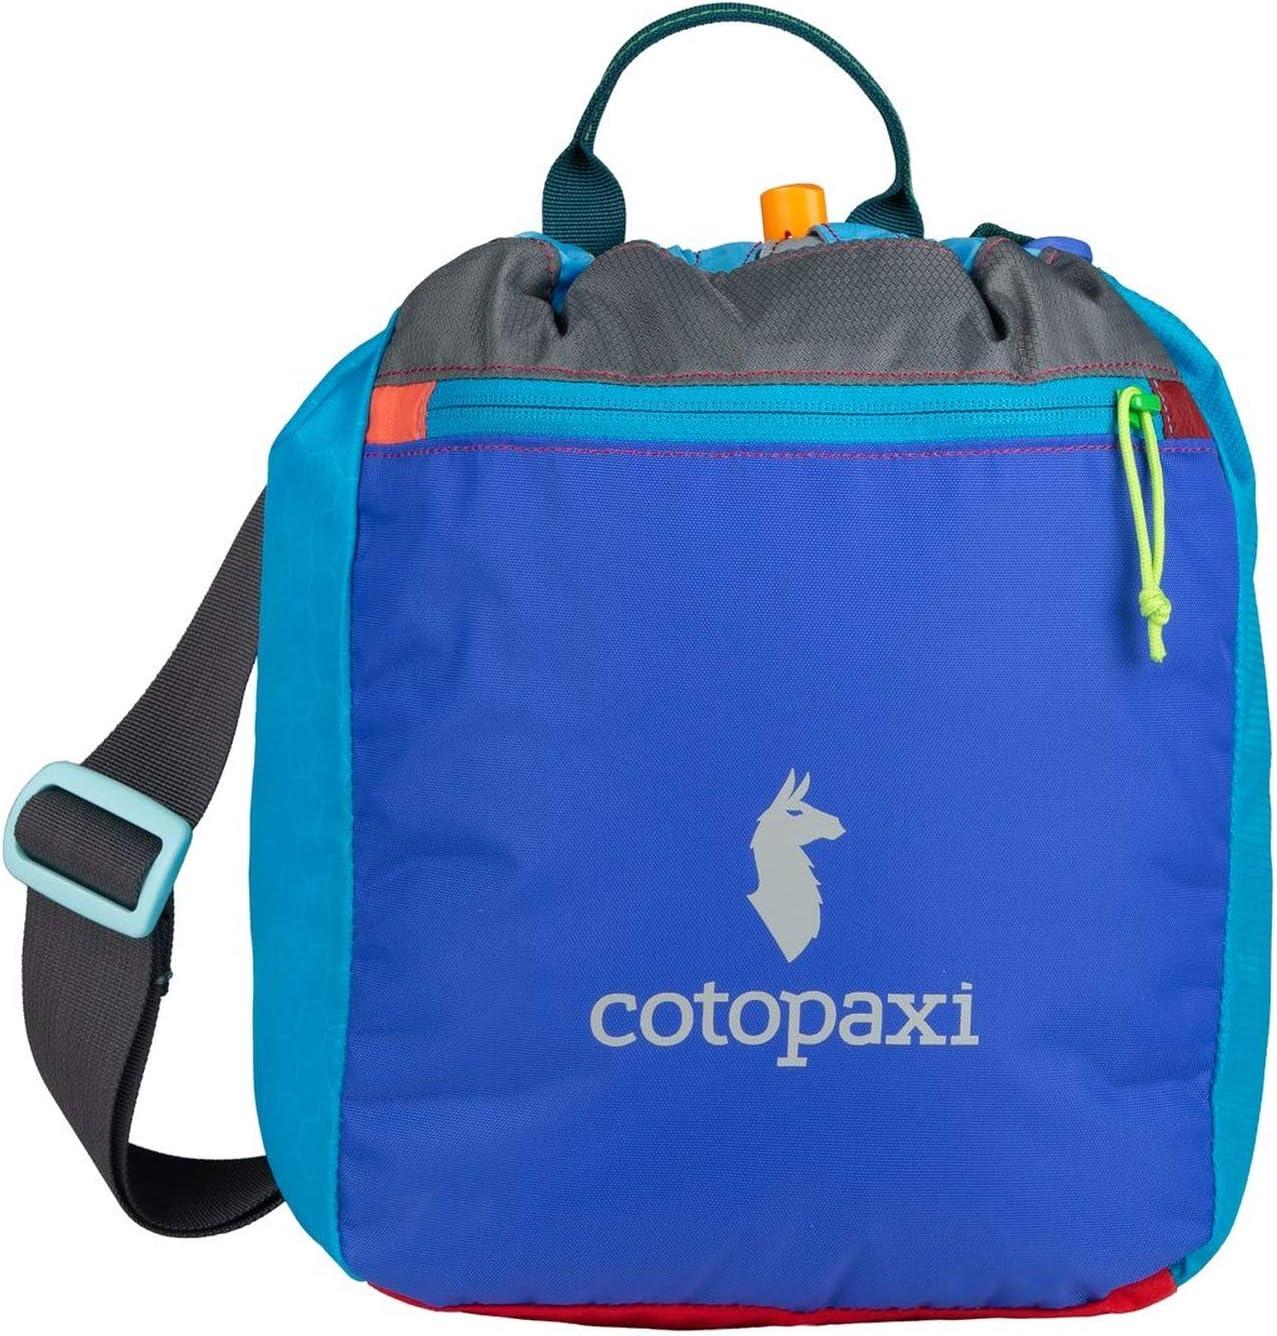 Cotopaxi Camaya Sidebag - Del Dia One of A Kind!